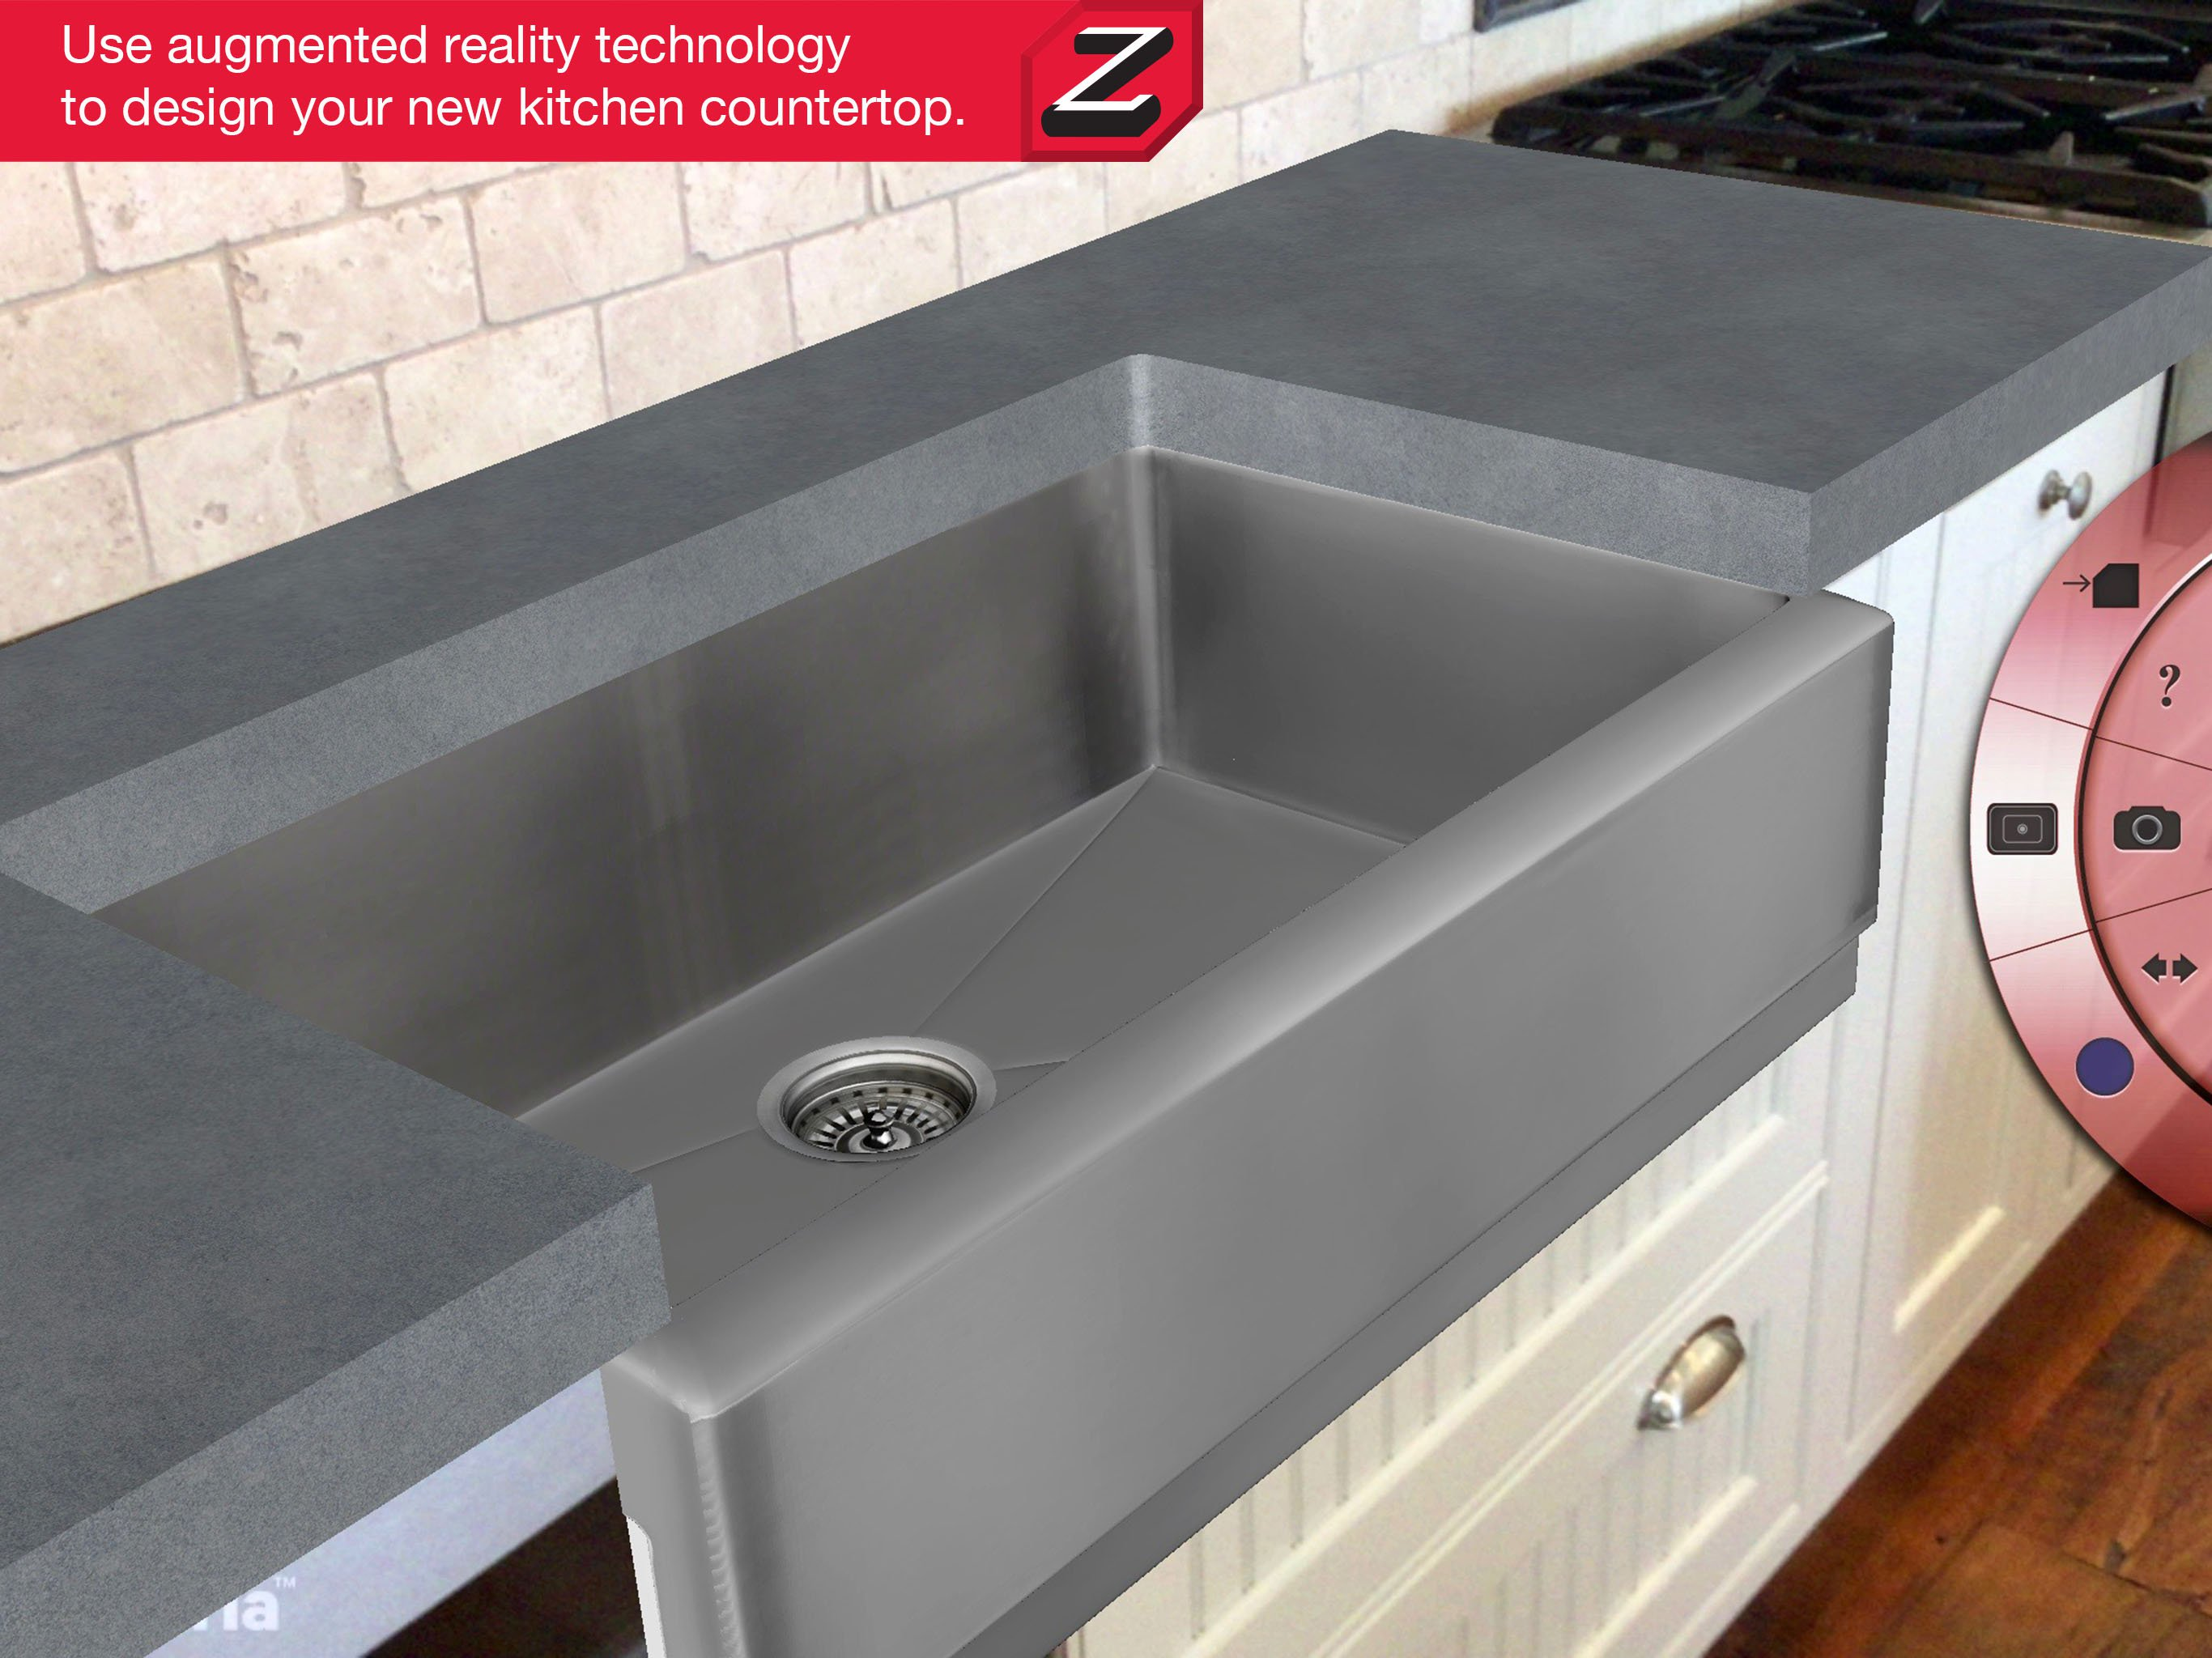 Concrete Countertop Solutions Releases